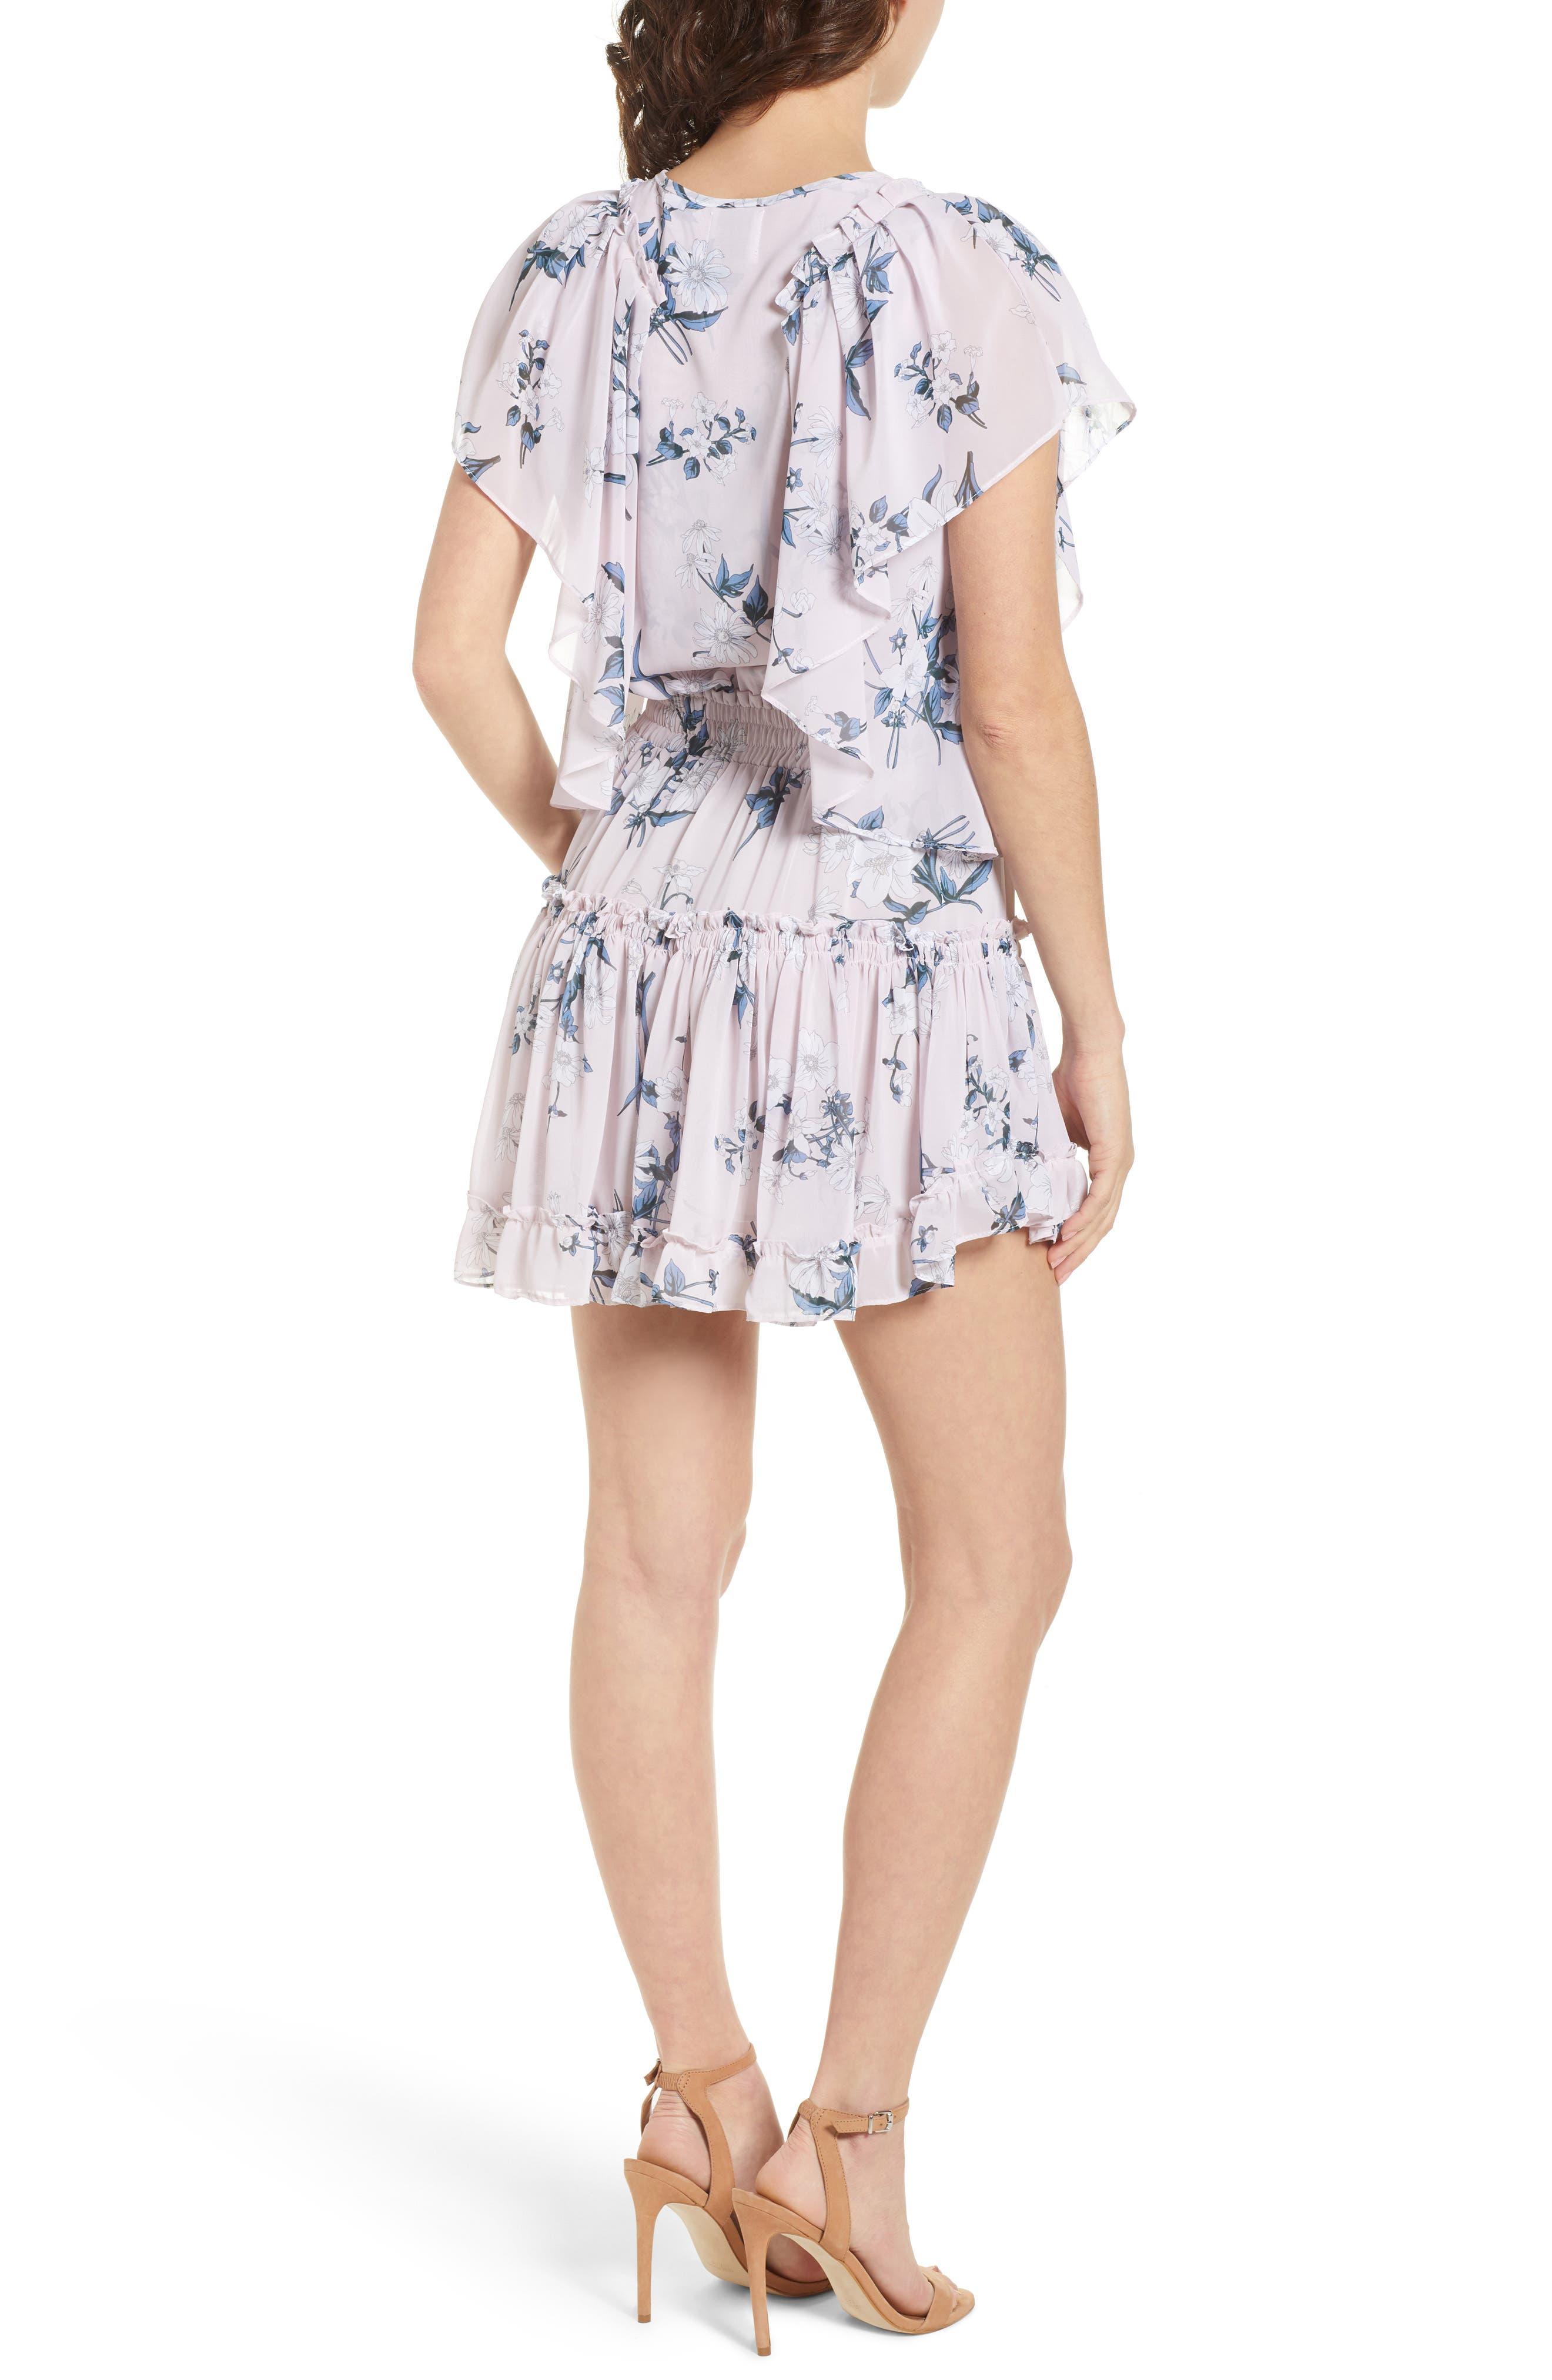 Lullu Dress,                             Alternate thumbnail 2, color,                             Multi Fe15